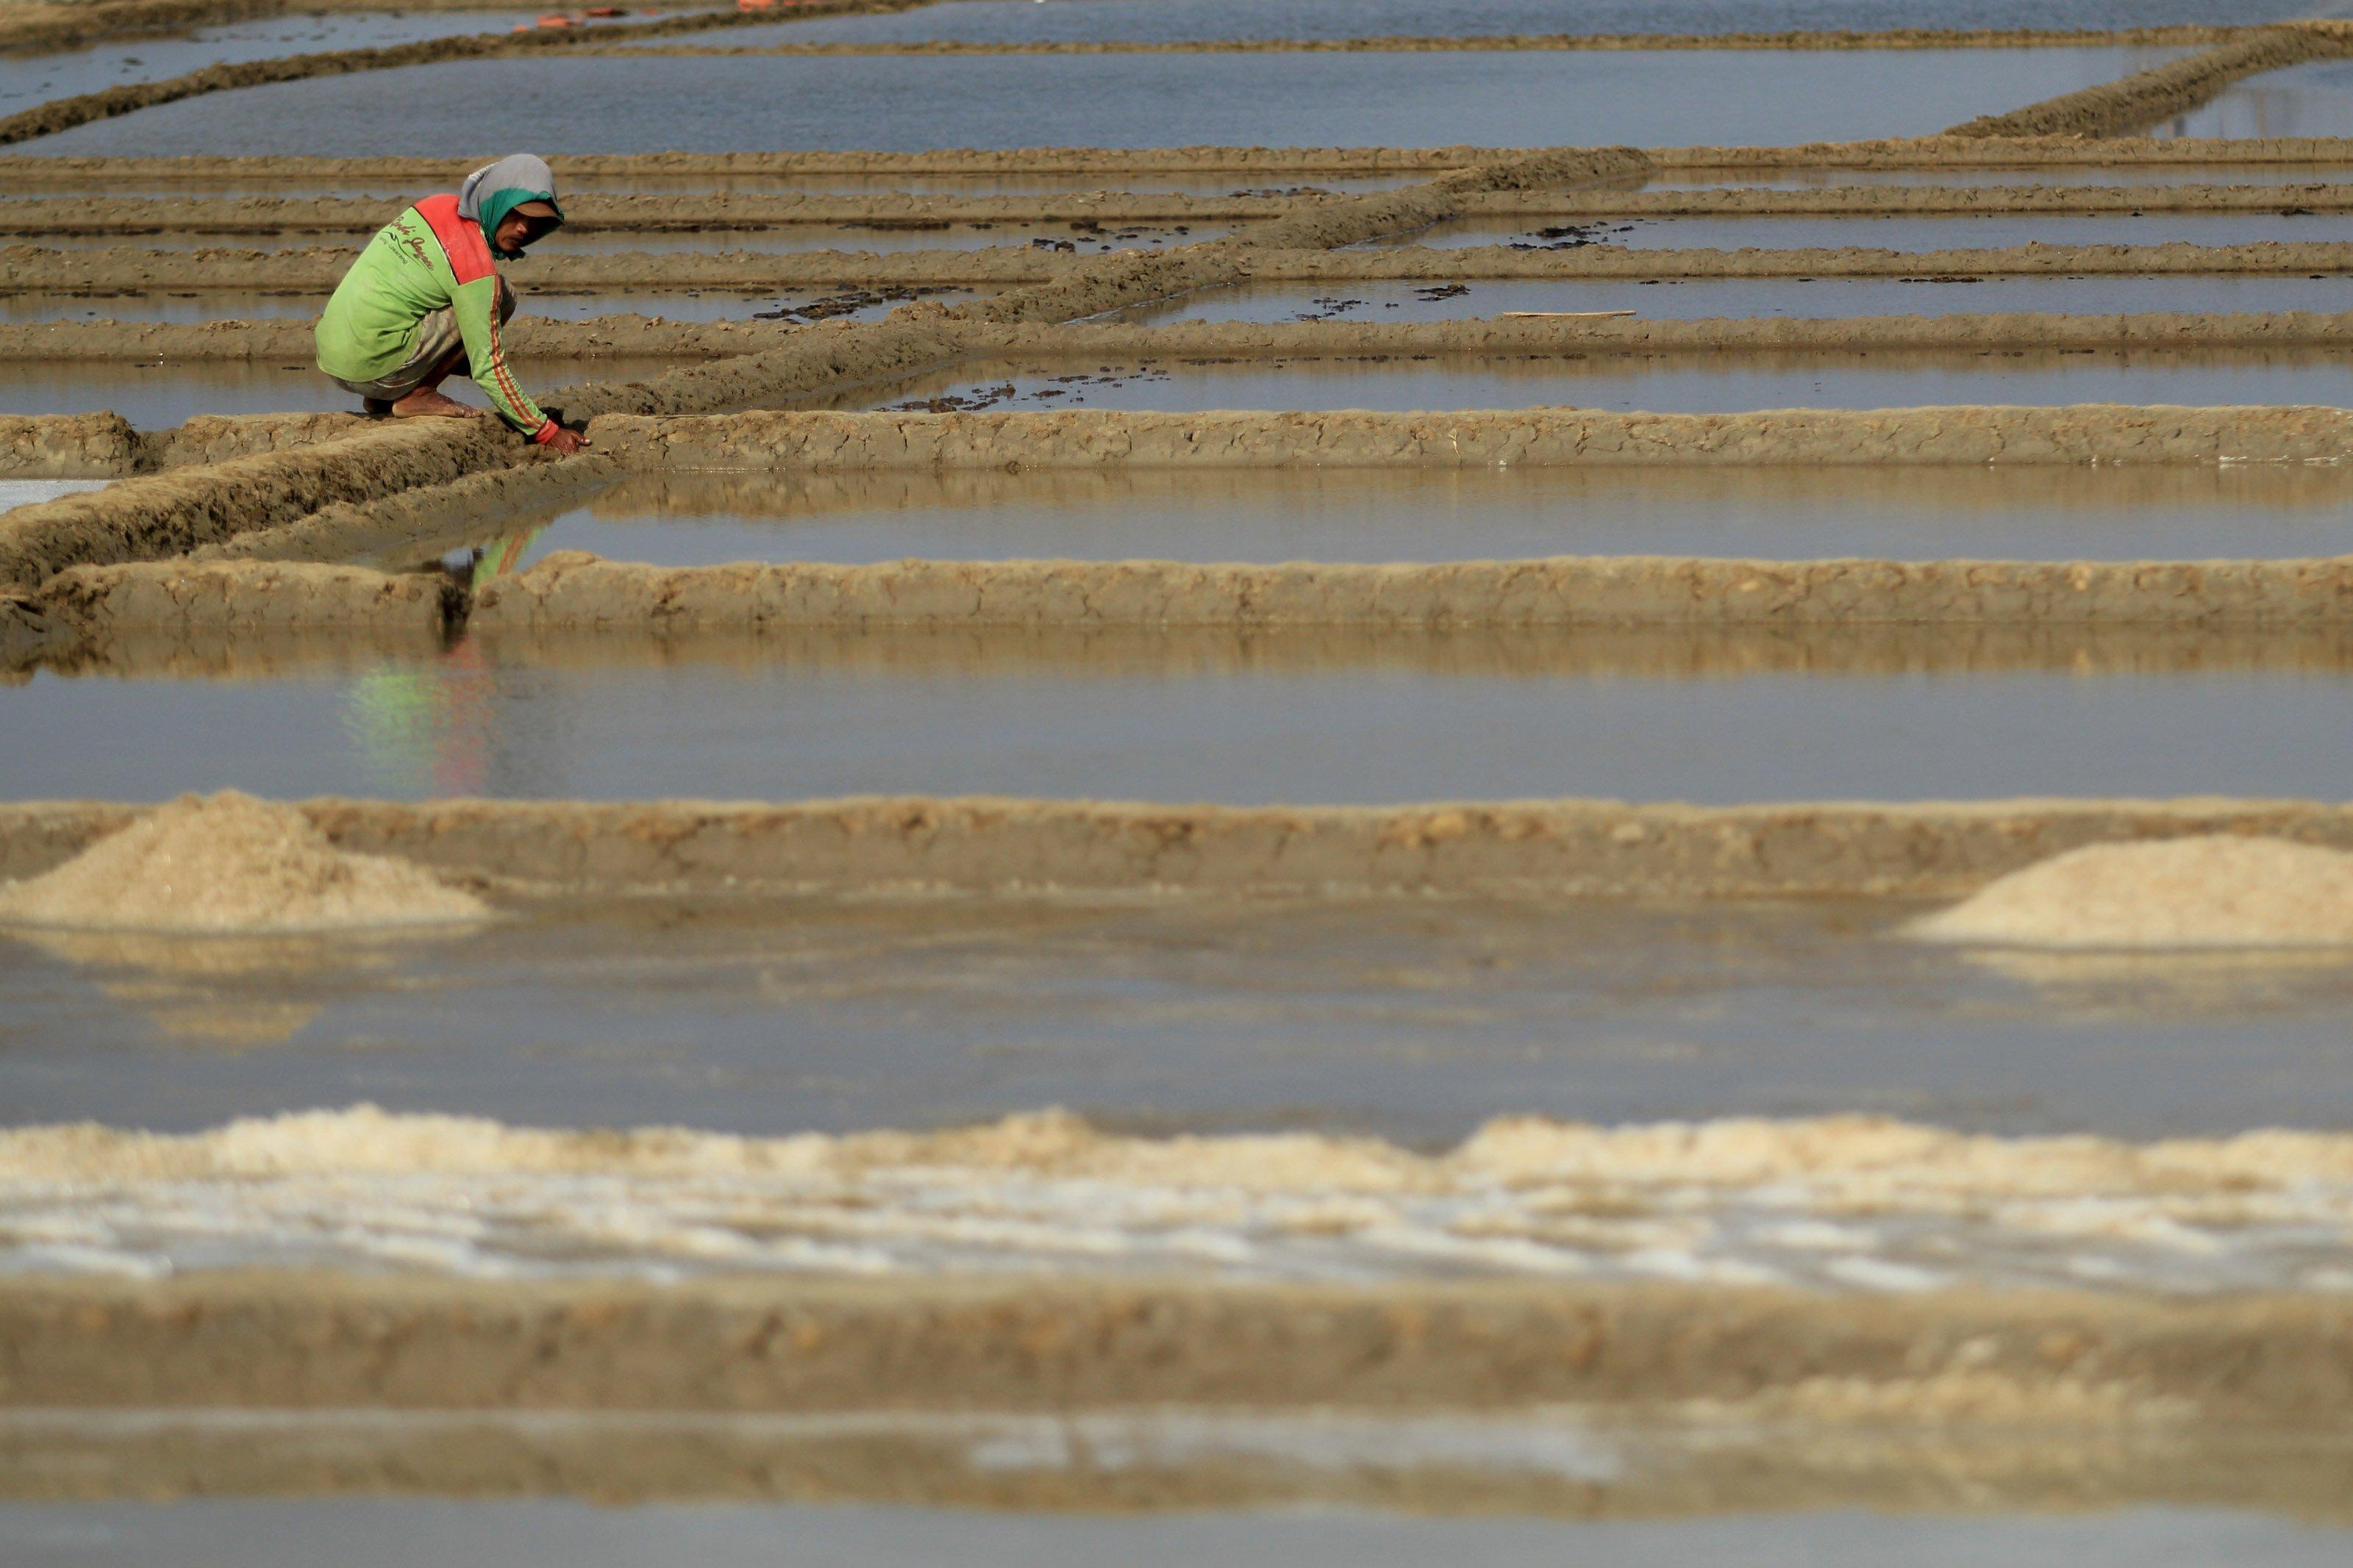 Petani garam was-was akan masuknya garam impor, yang dikhawatirkan akan menekan harga kembali rendah, mereka berharap pemerintah mengeluarkan kebijakan yang tepat agar tidak terjadi kelangkaan garam di pasaran, namun juga melindungi petani yang menggantungkan hidupnya dari produksi garam.